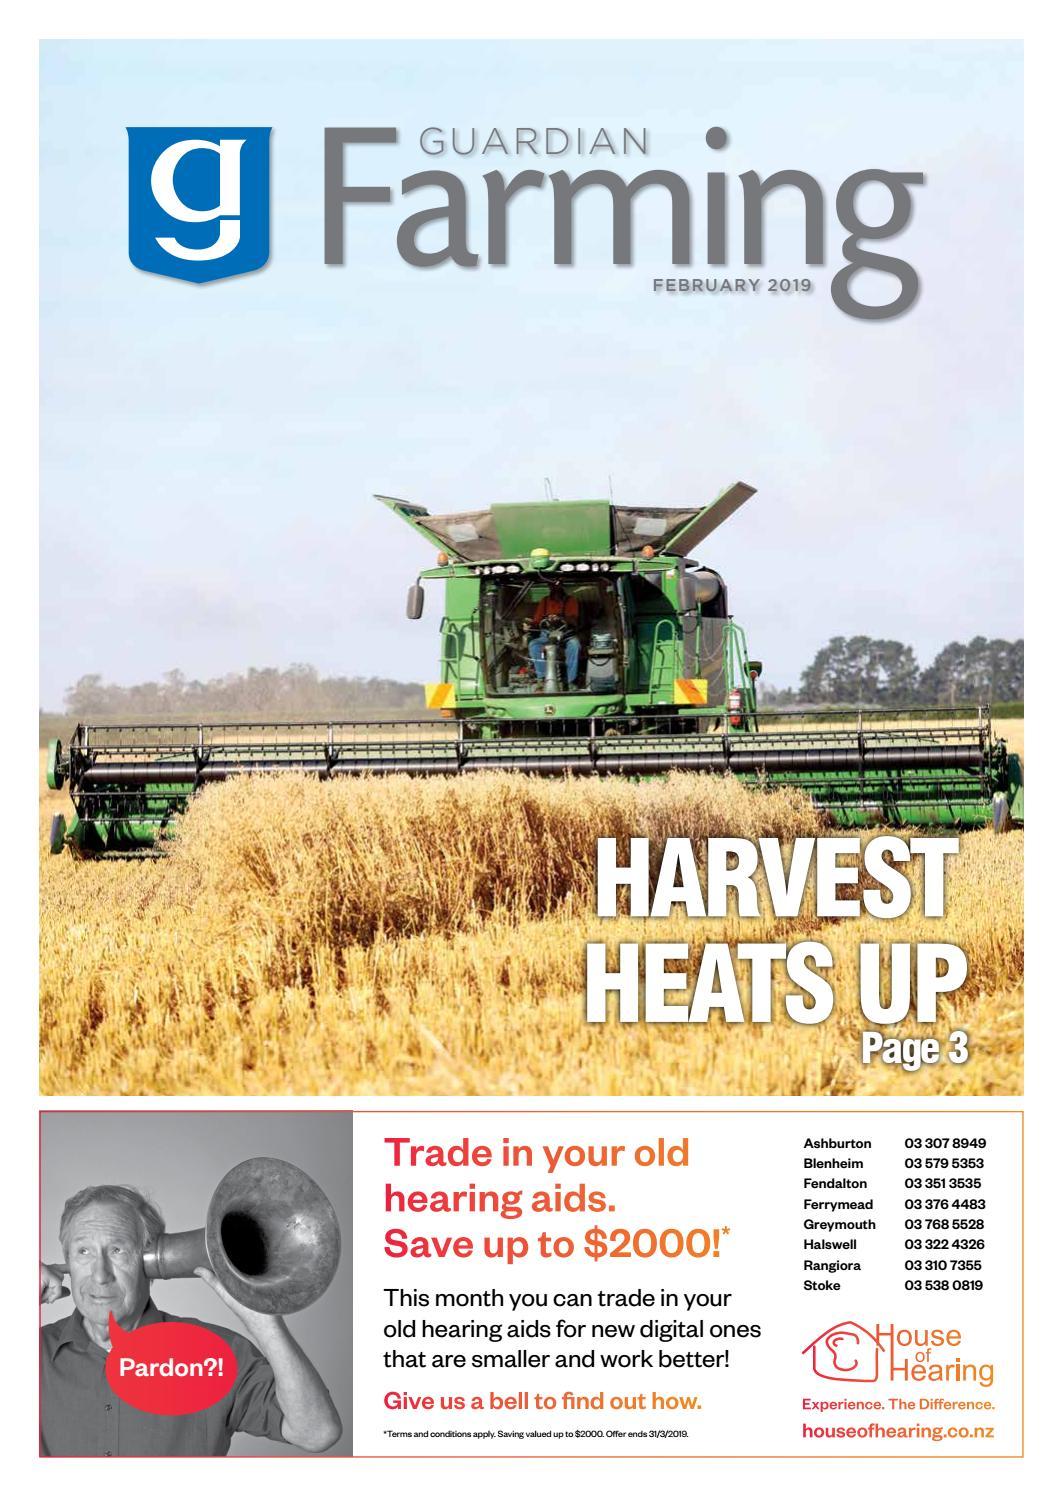 Guardian Farming February 2019 By Ashburton Guardian Issuu